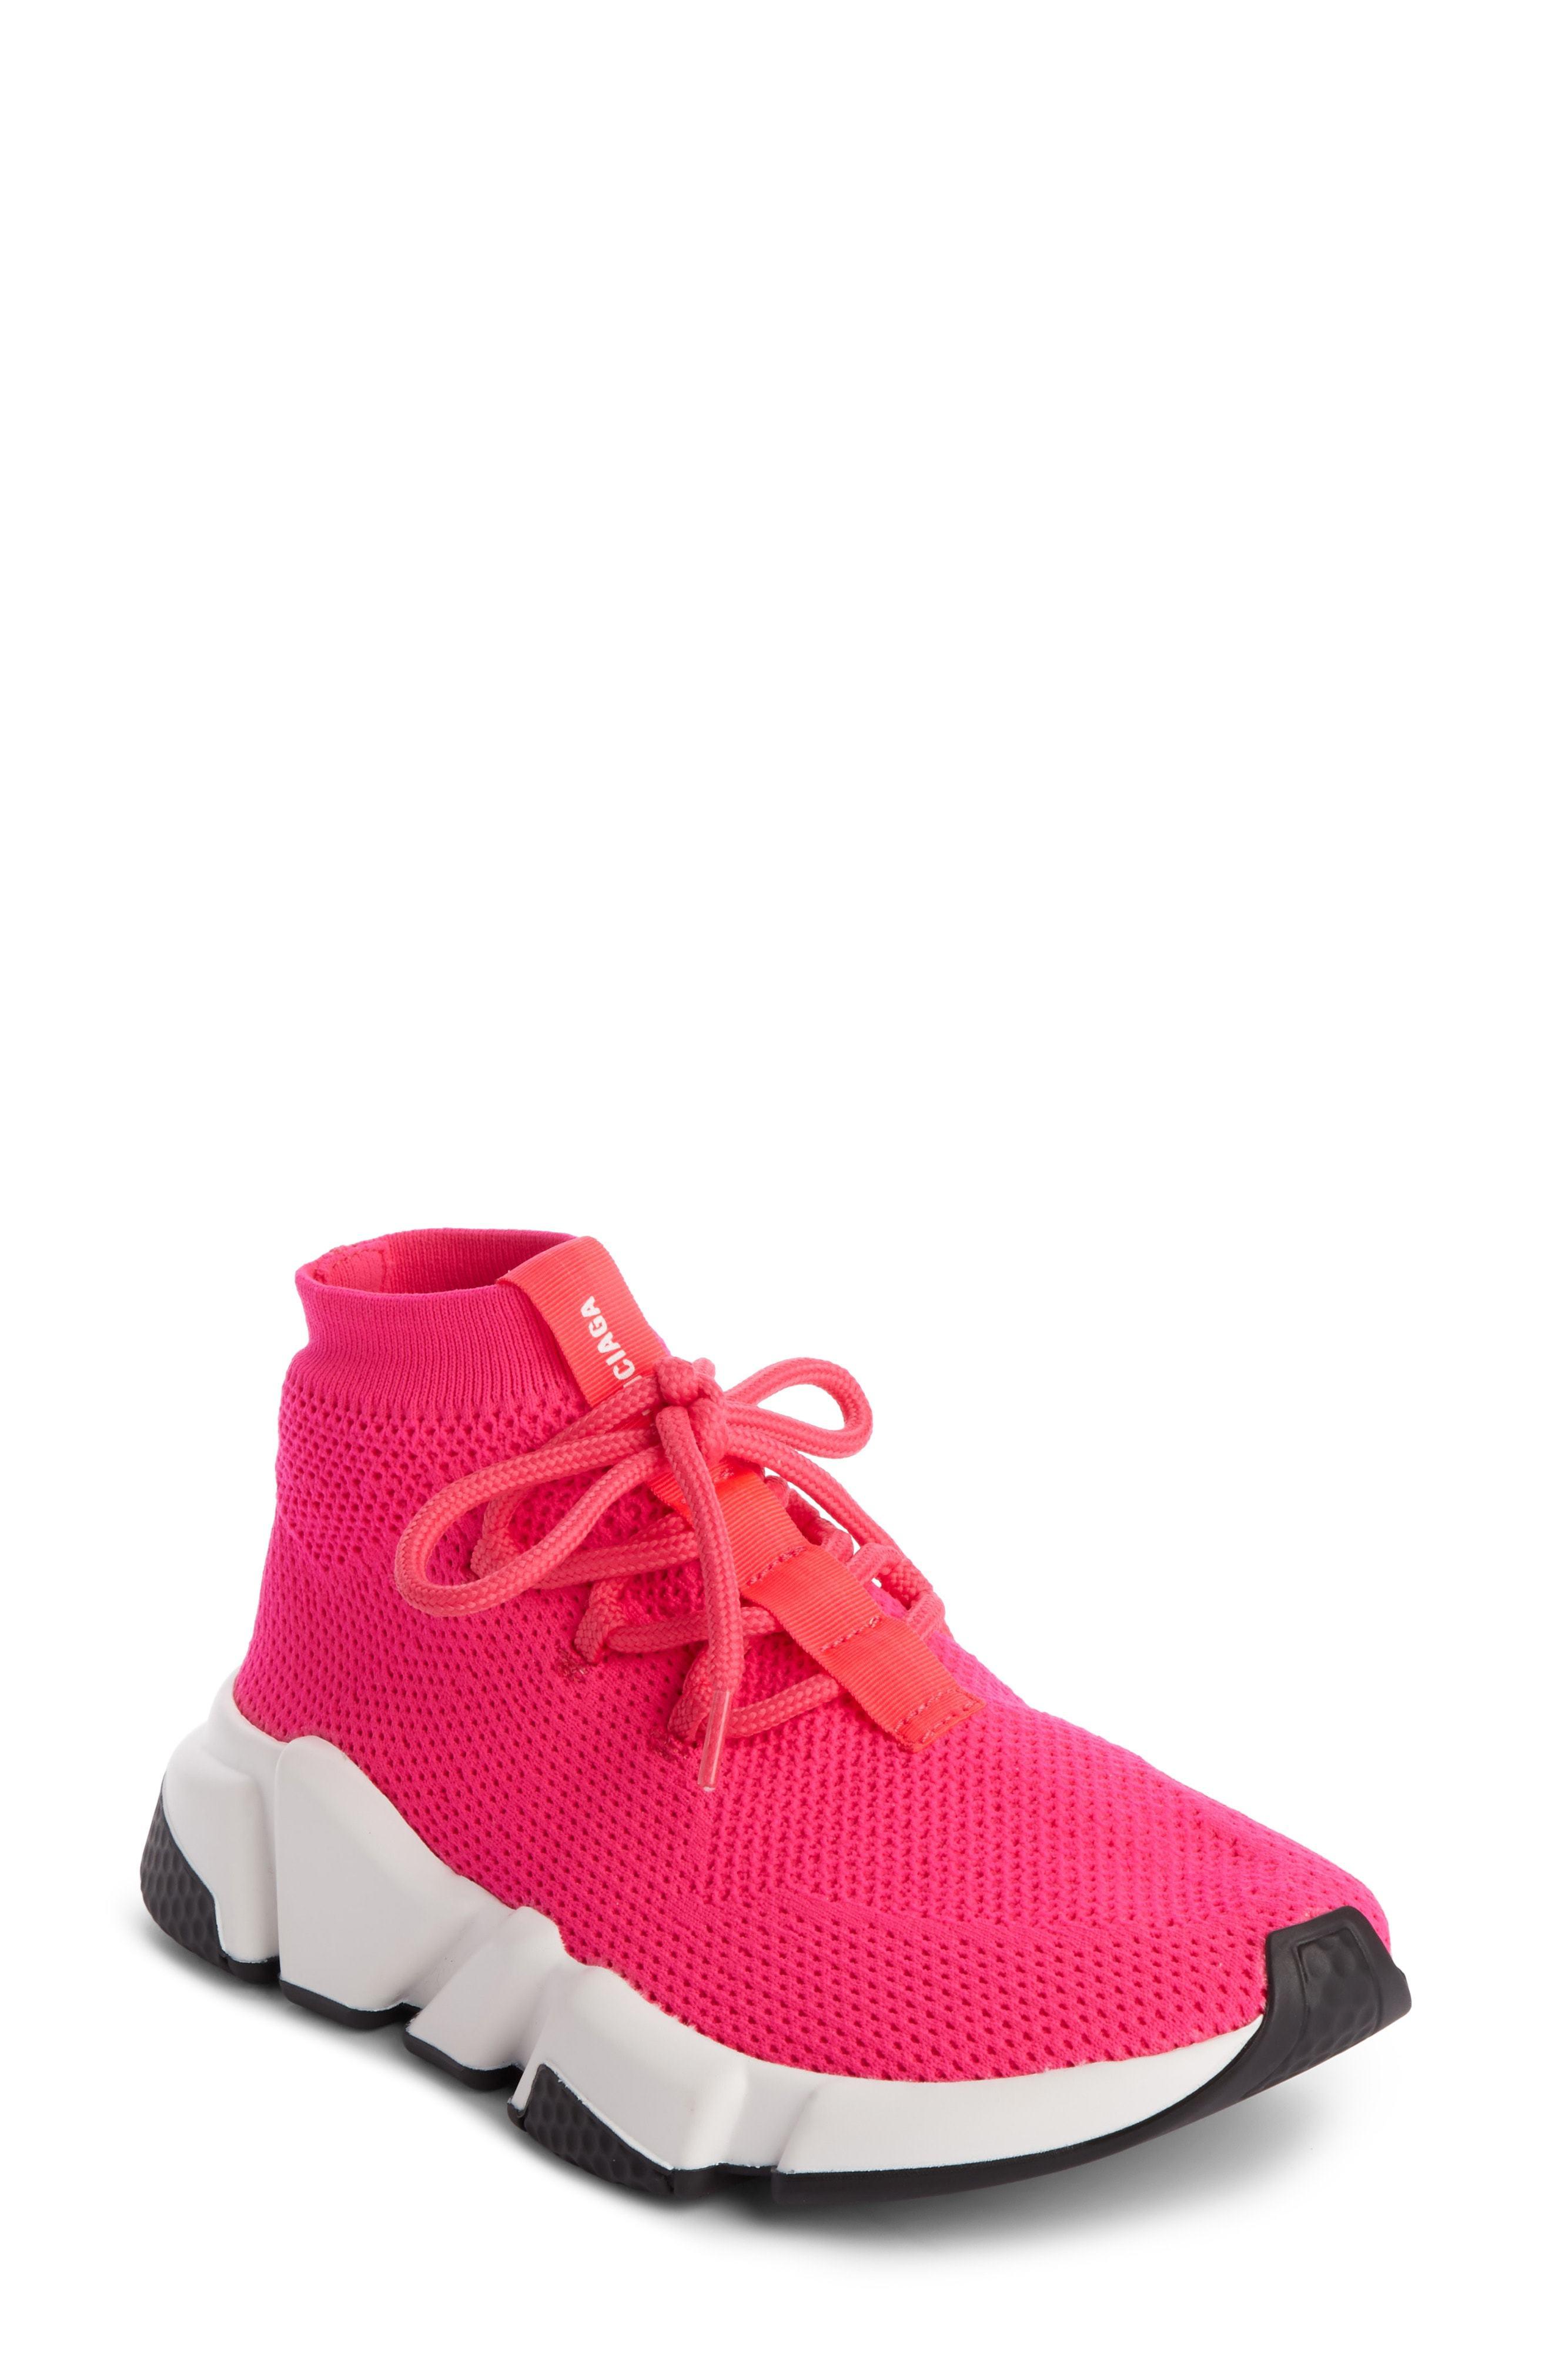 e4350172972c ... Balenciaga Low Speed Lace Up Sneaker